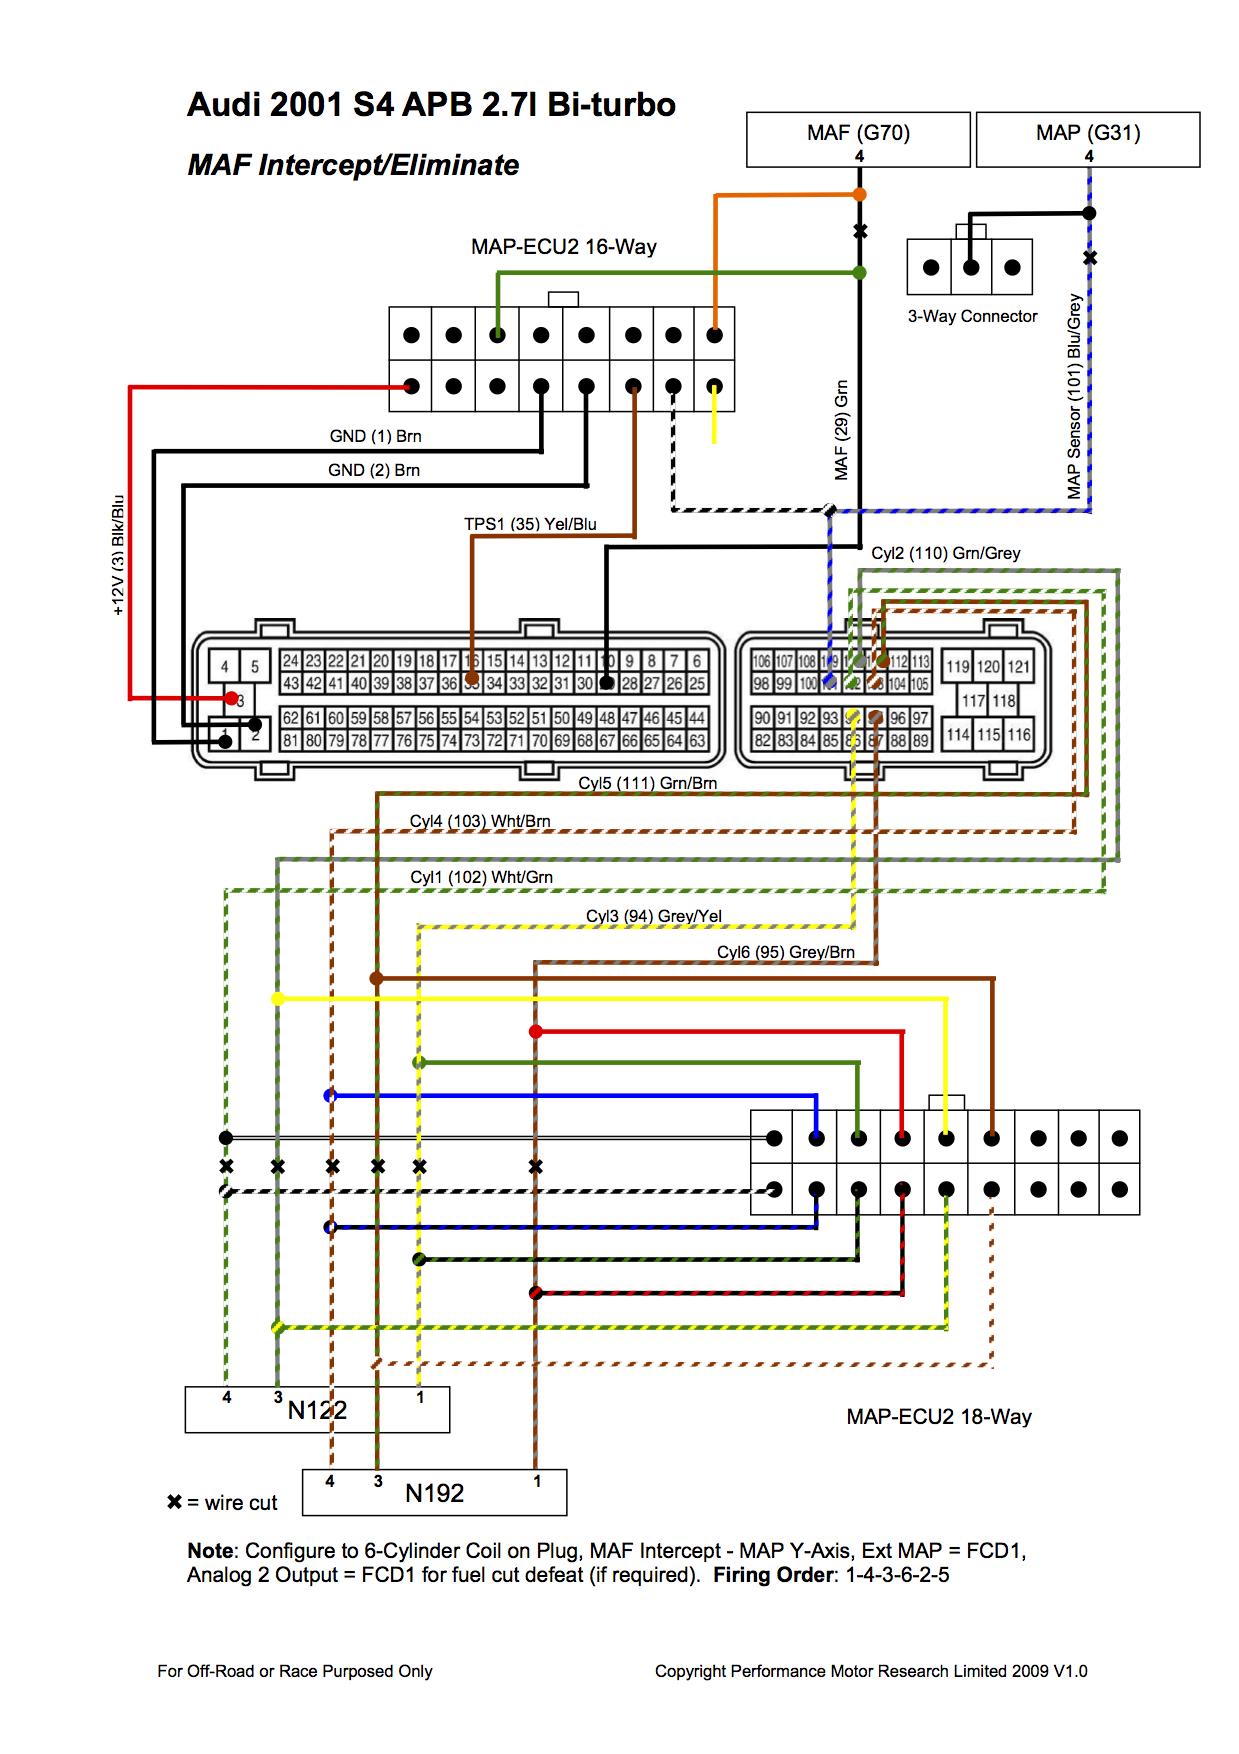 hight resolution of chrysler 300 wiring diagram furthermore chrysler new yorker wiring